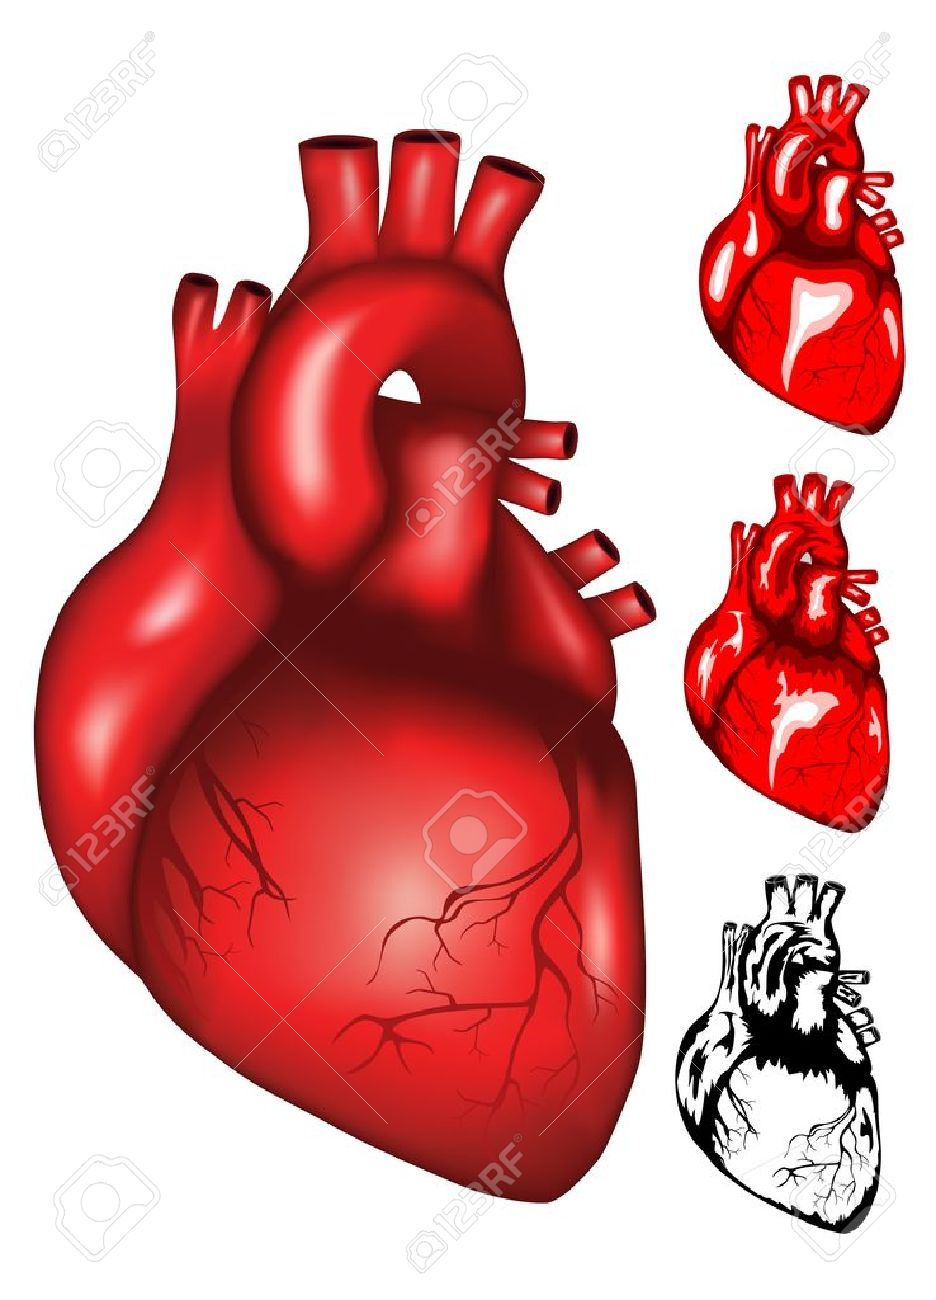 Human Heart Vector Image Vector Illustration of Human